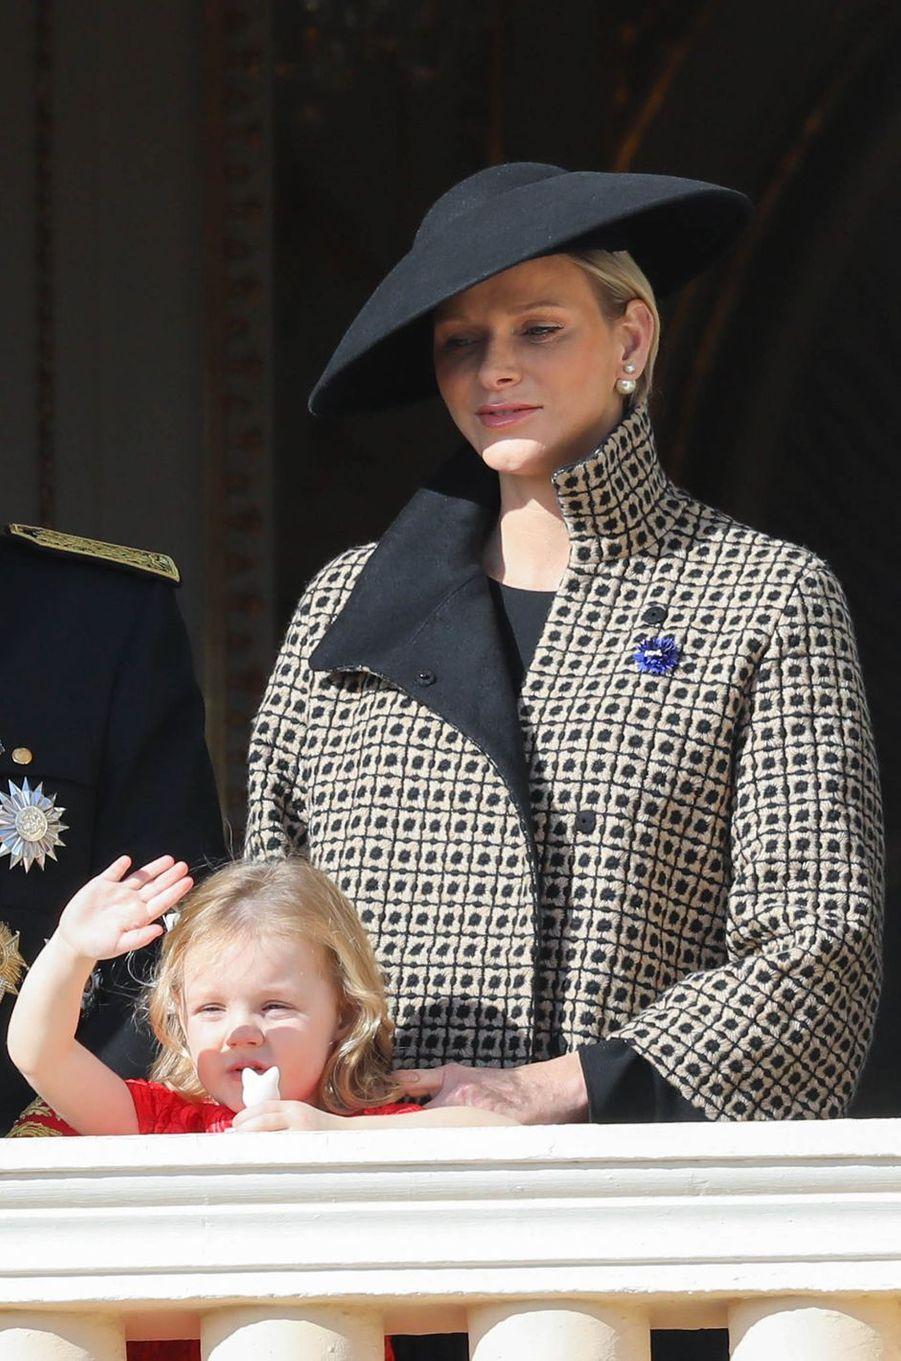 La princesse Gabriella de Monaco avec sa mère la princesse Charlène, à Monaco le 19 novembre 2018